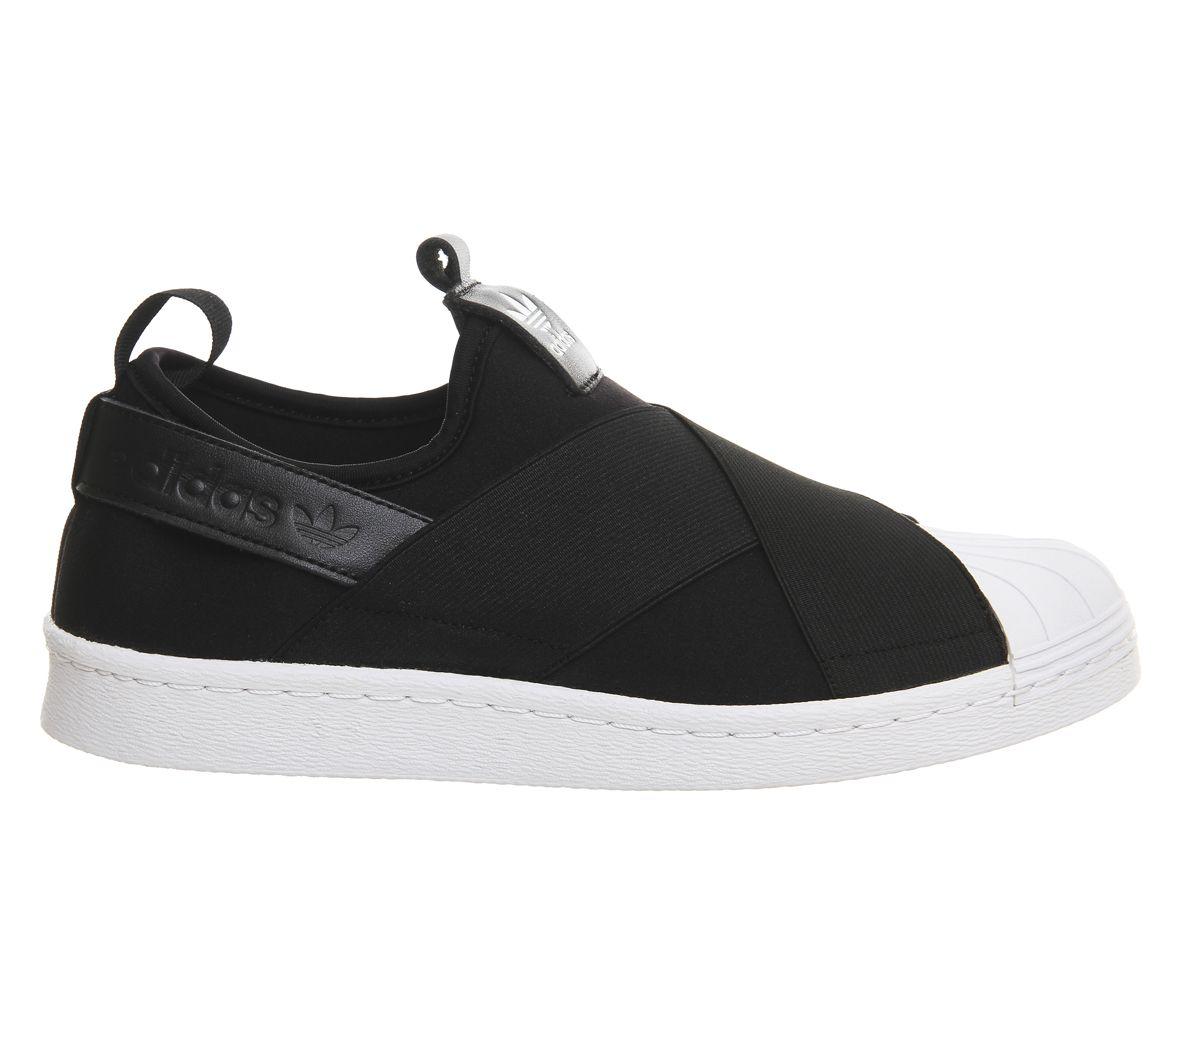 Black · Adidas Superstar Slip On Core Black White ...